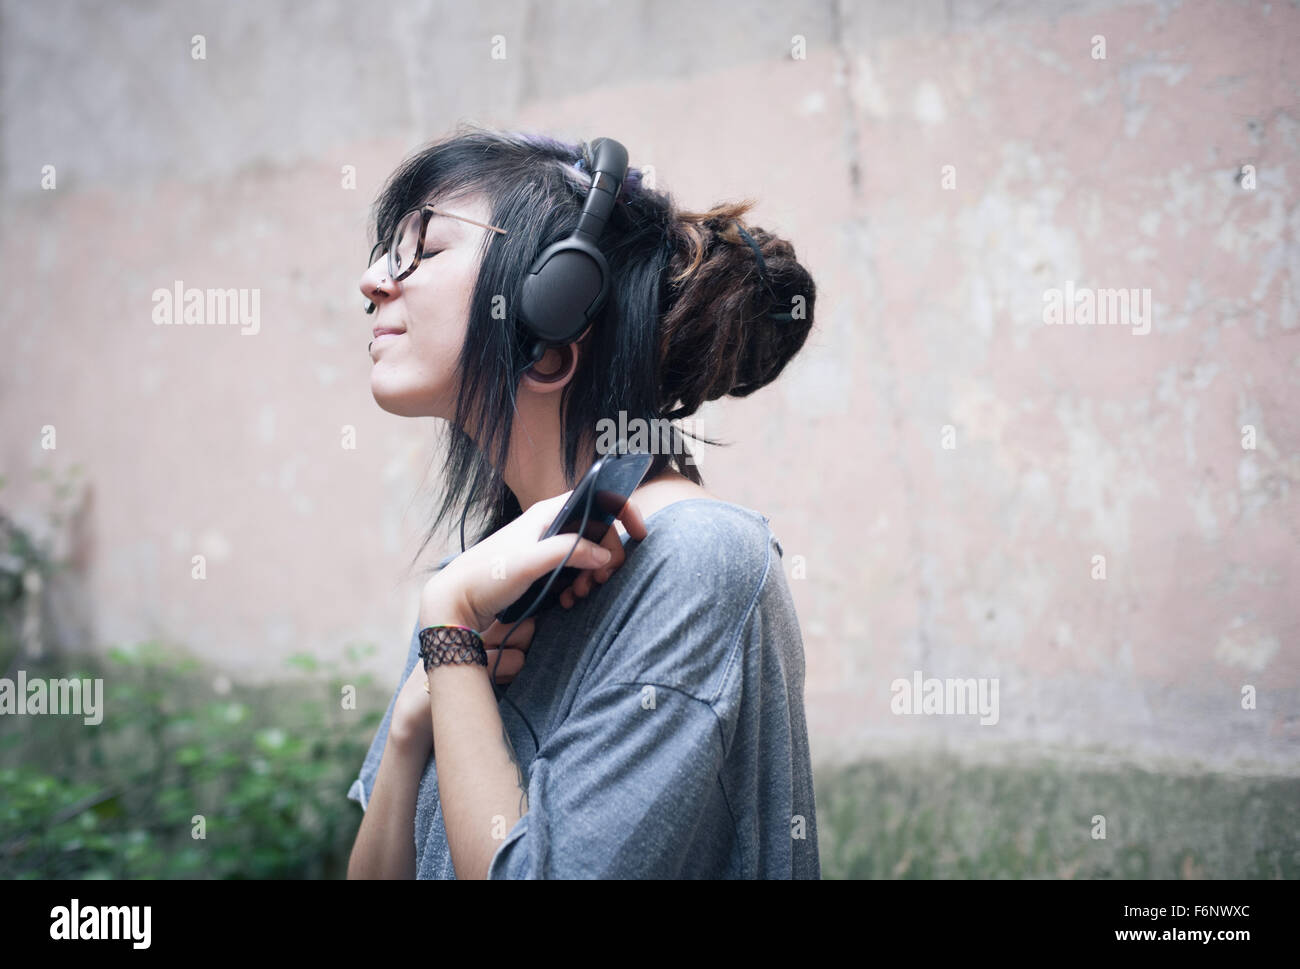 Mujer Adolescente con auriculares escuchando música con profunda emoción Imagen De Stock